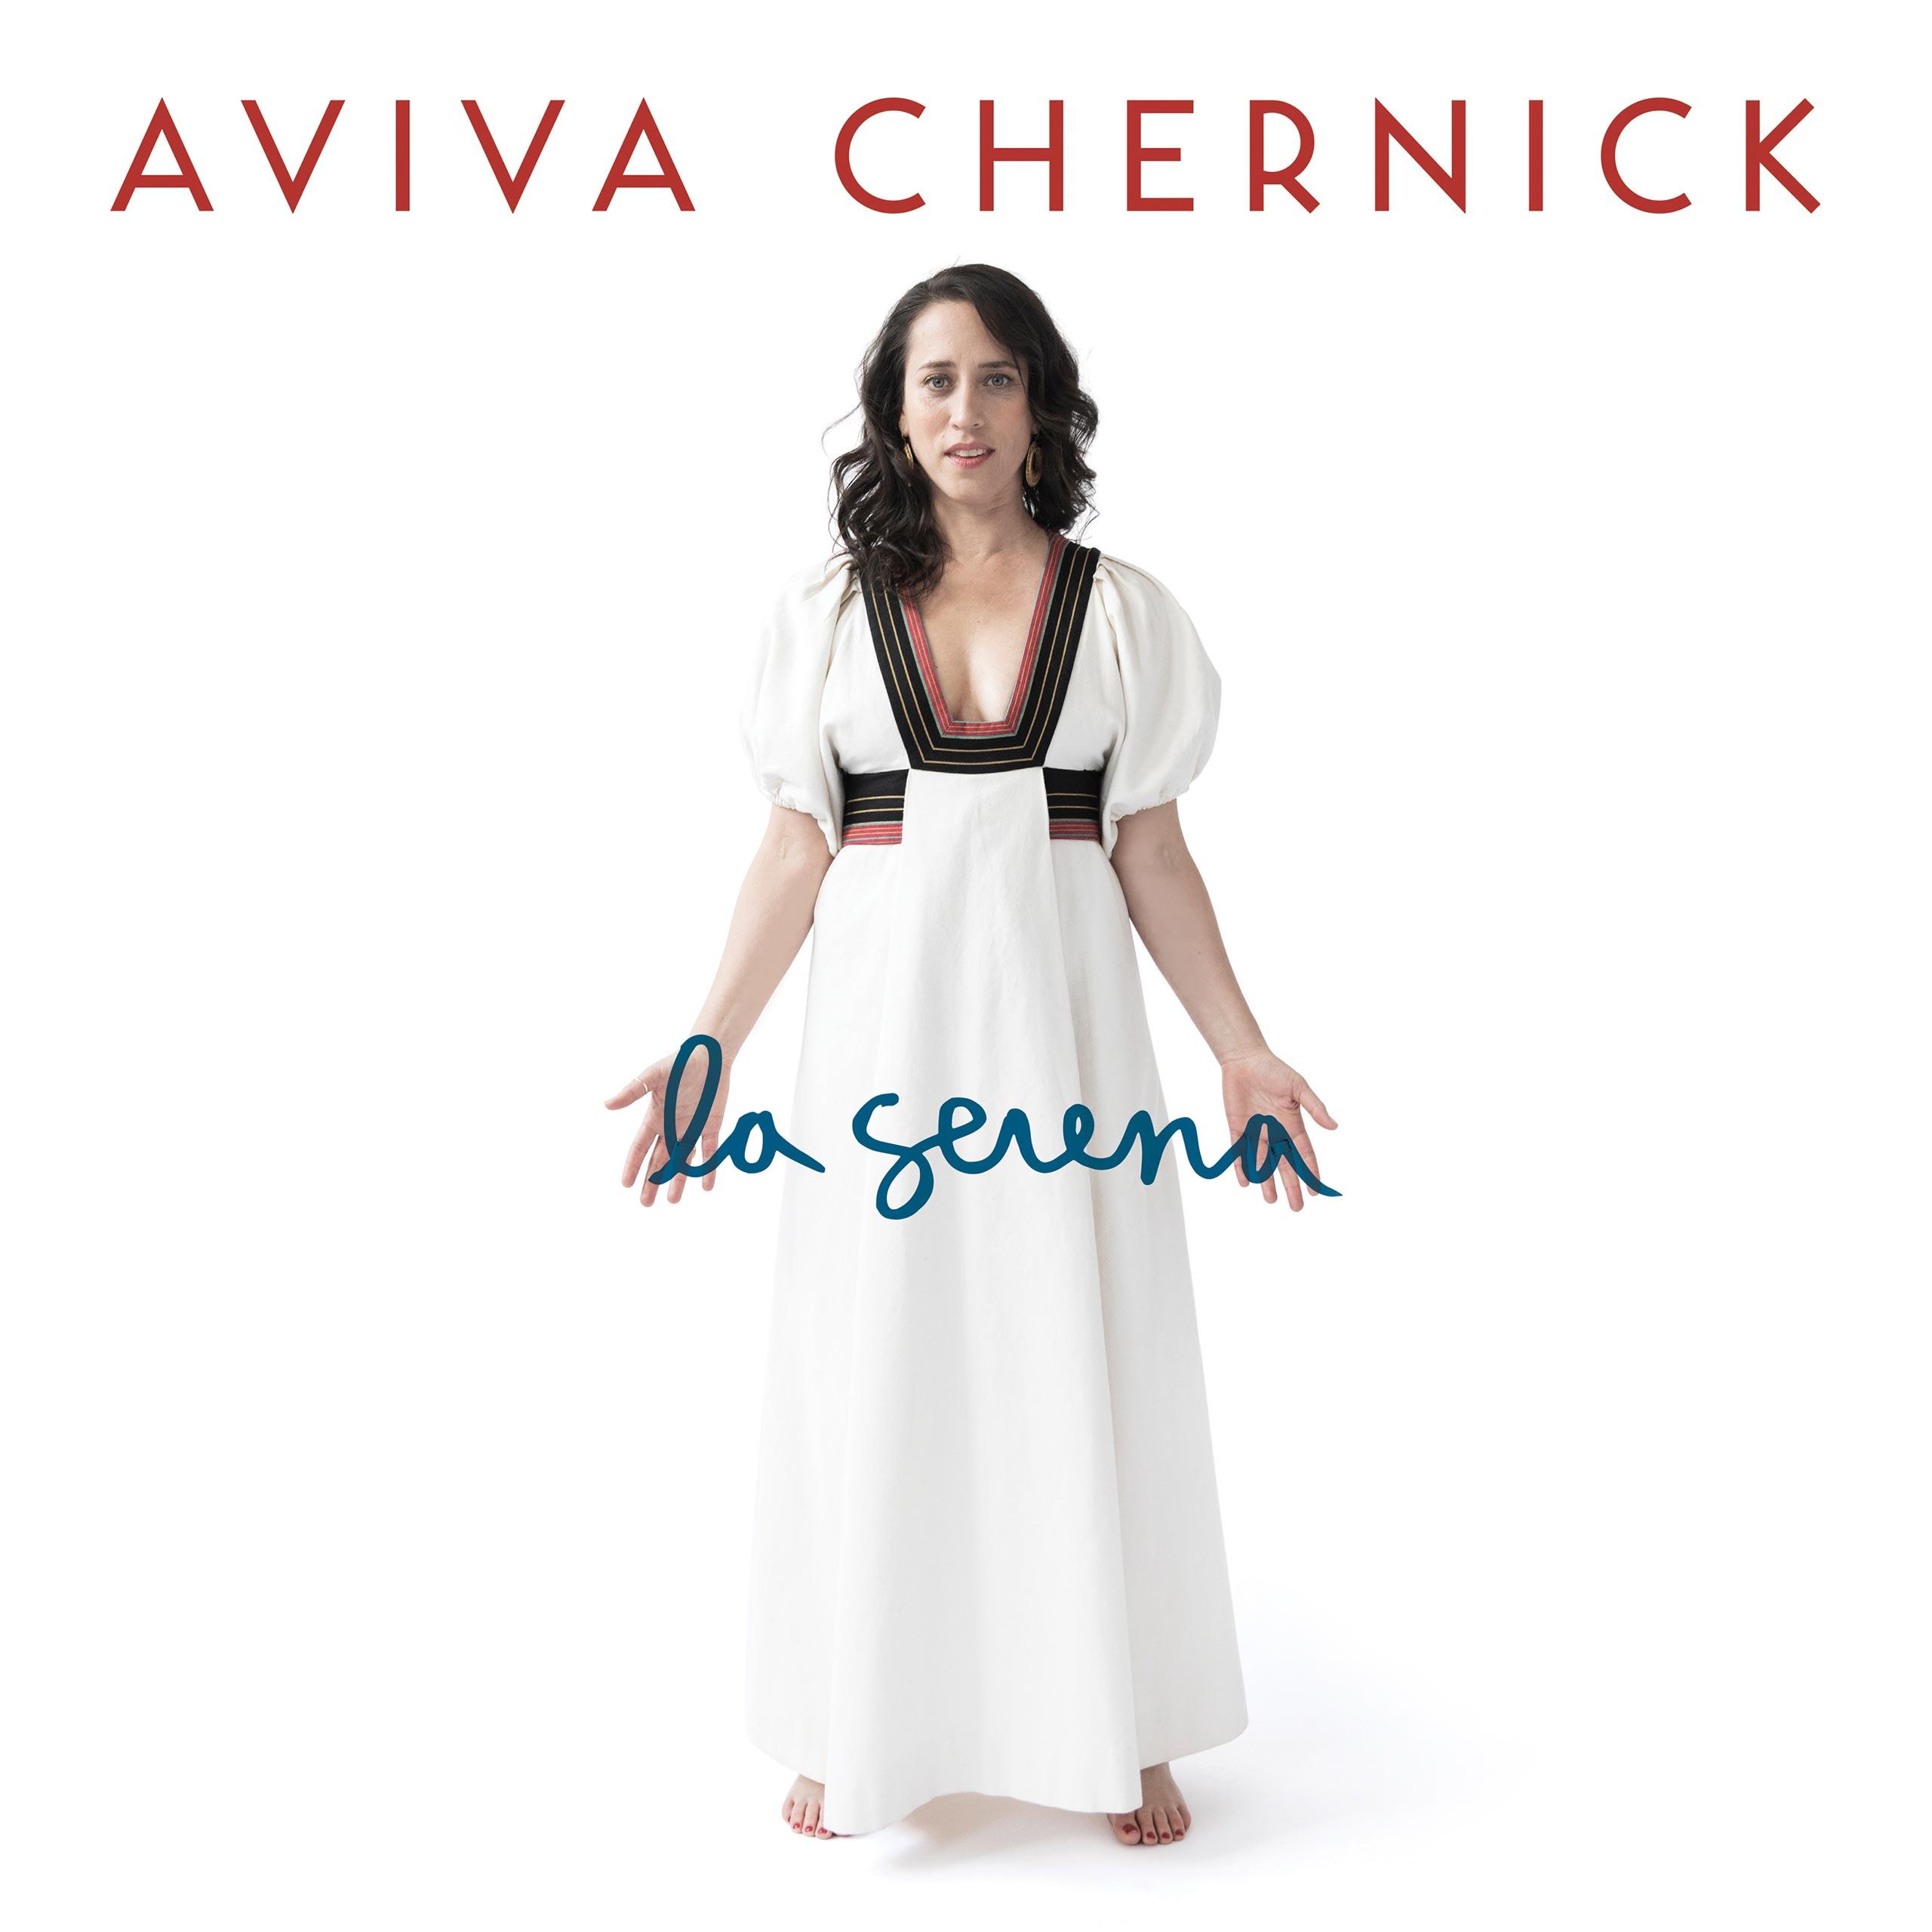 Aviva Chernick – La Serena – Album cover